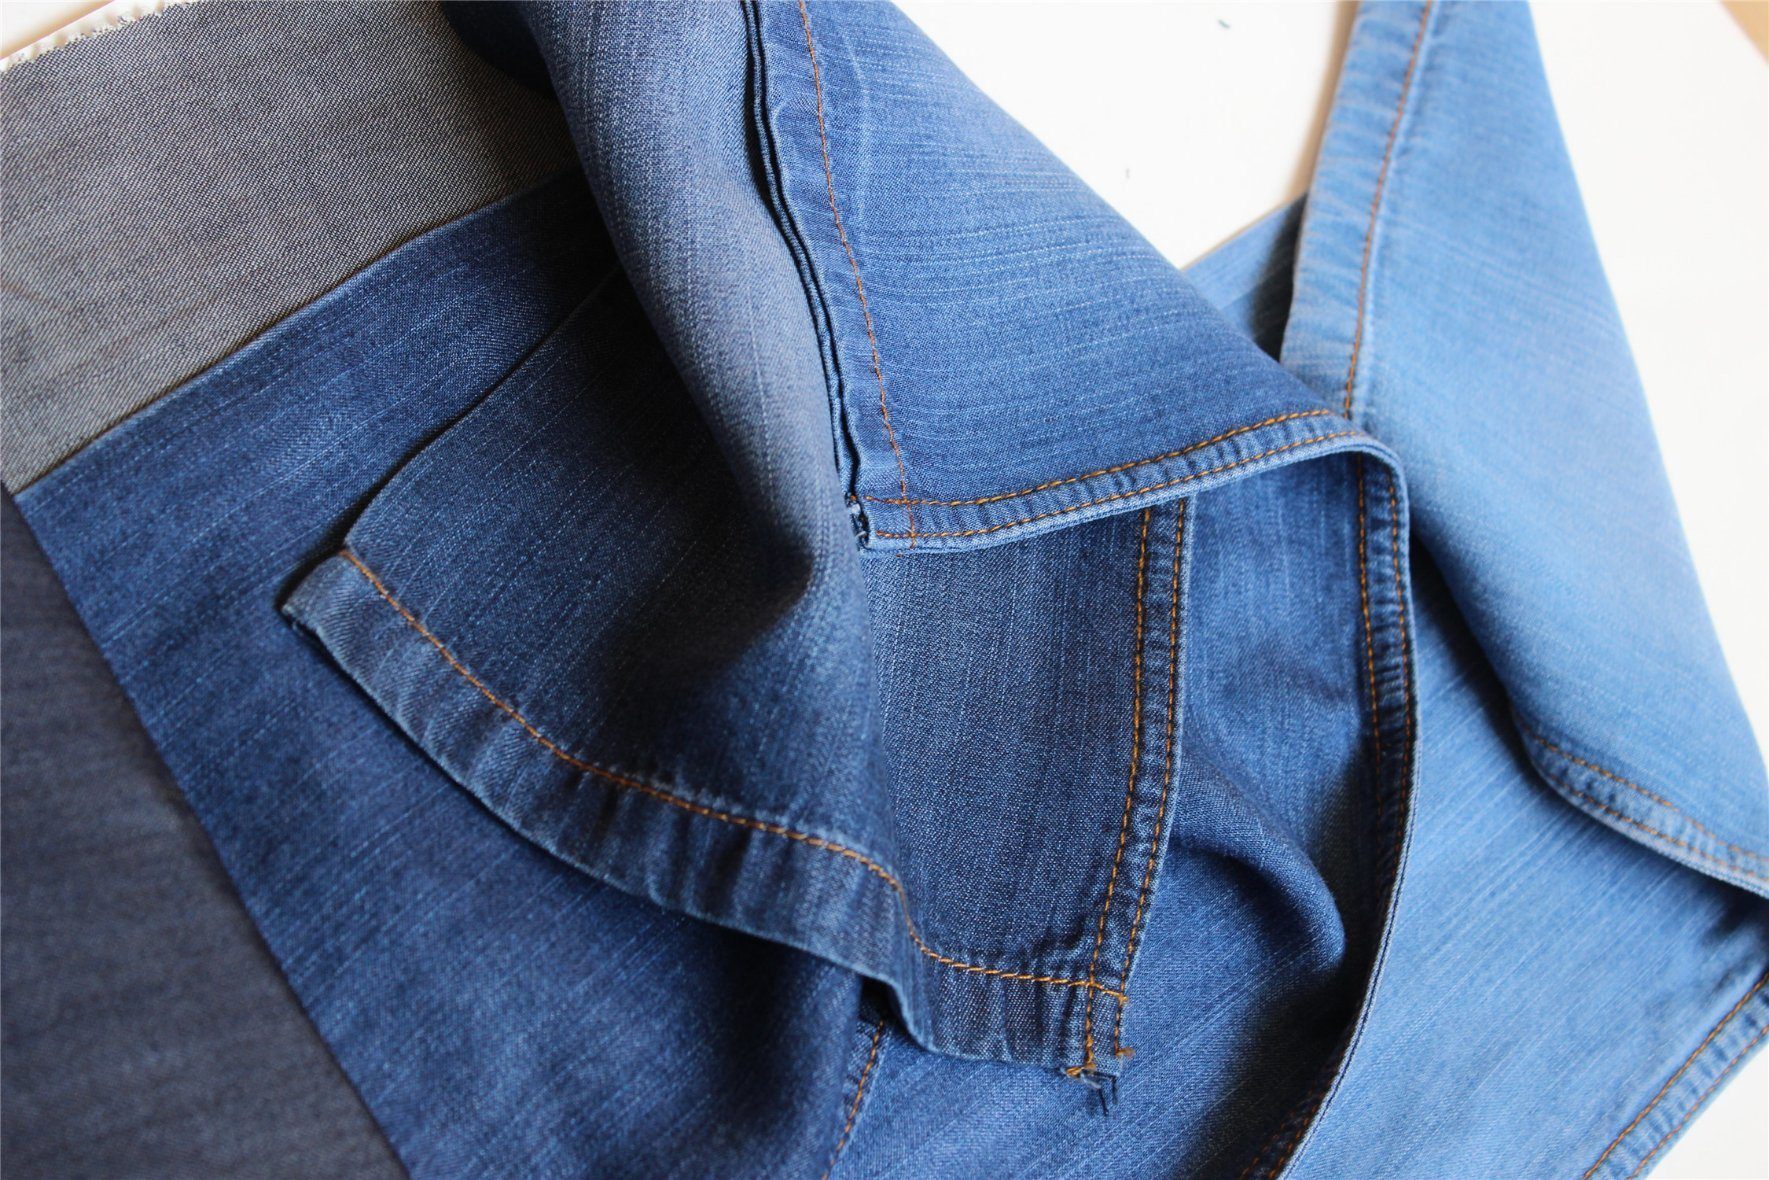 100% Lyocell Indigo Denim for T-Shirt